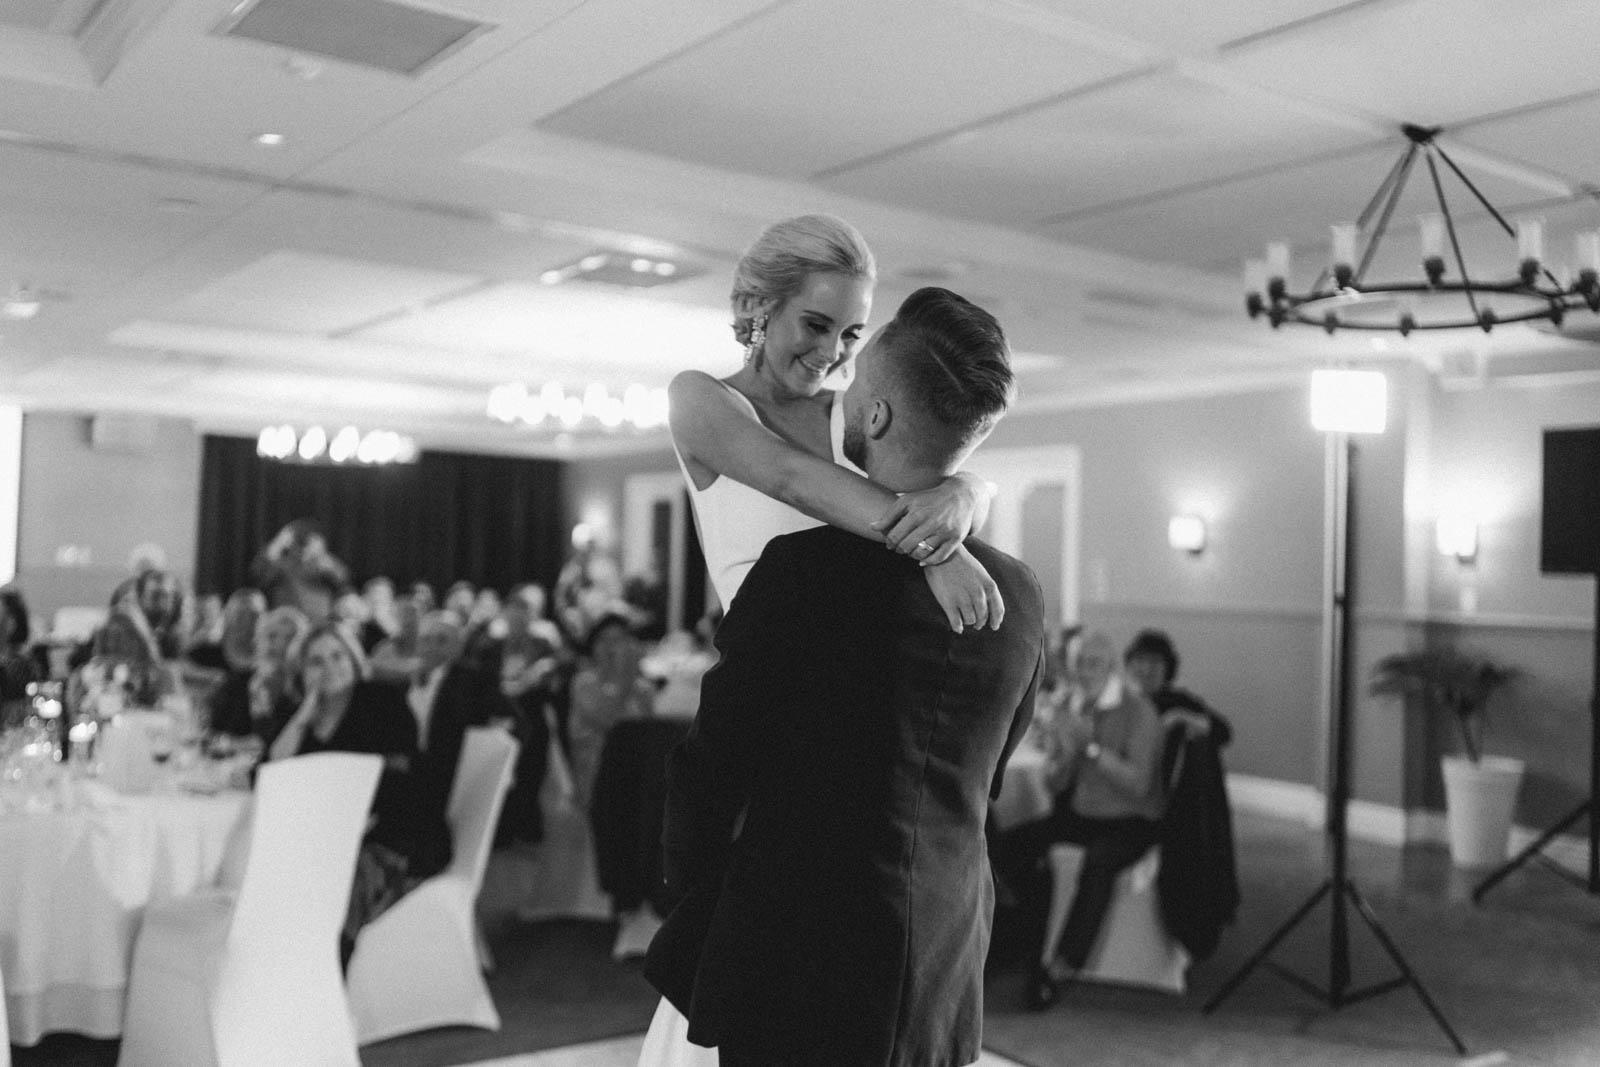 newfound-k-s-hilton-taupo-wedding-photographer-110